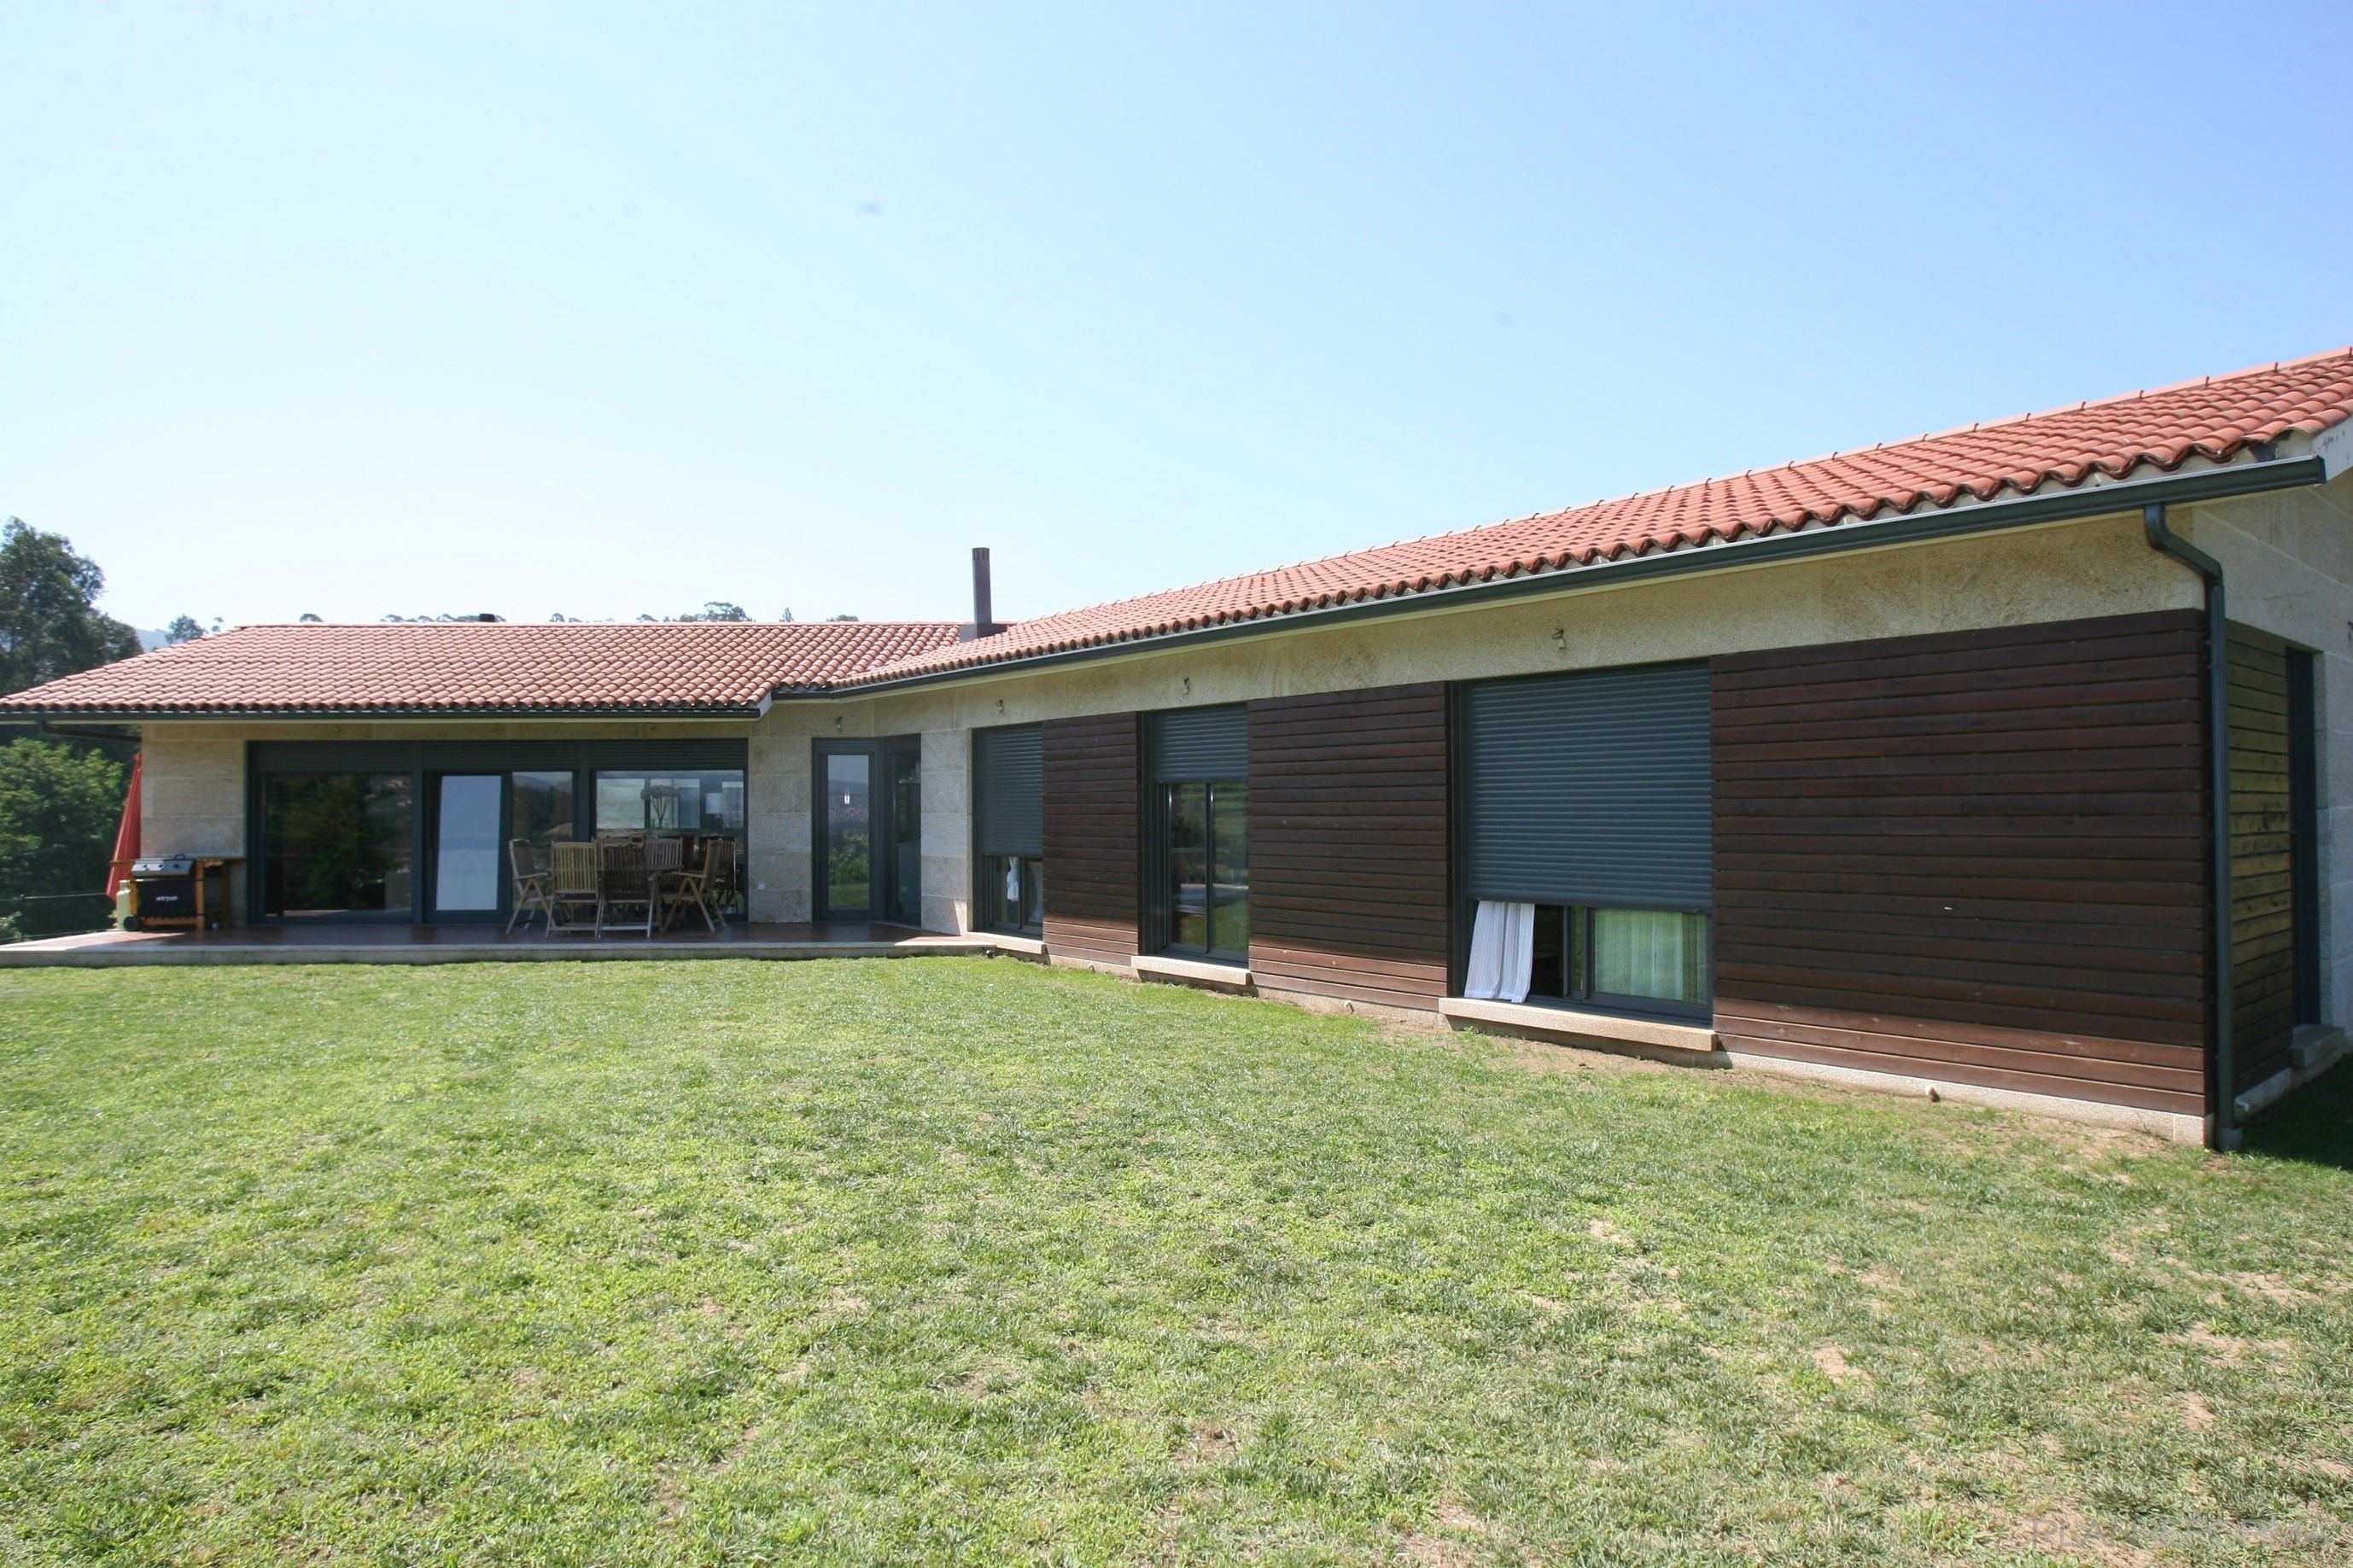 Ideas de casas exterior jardin porche estilo for Decoracion exterior jardin contemporaneo